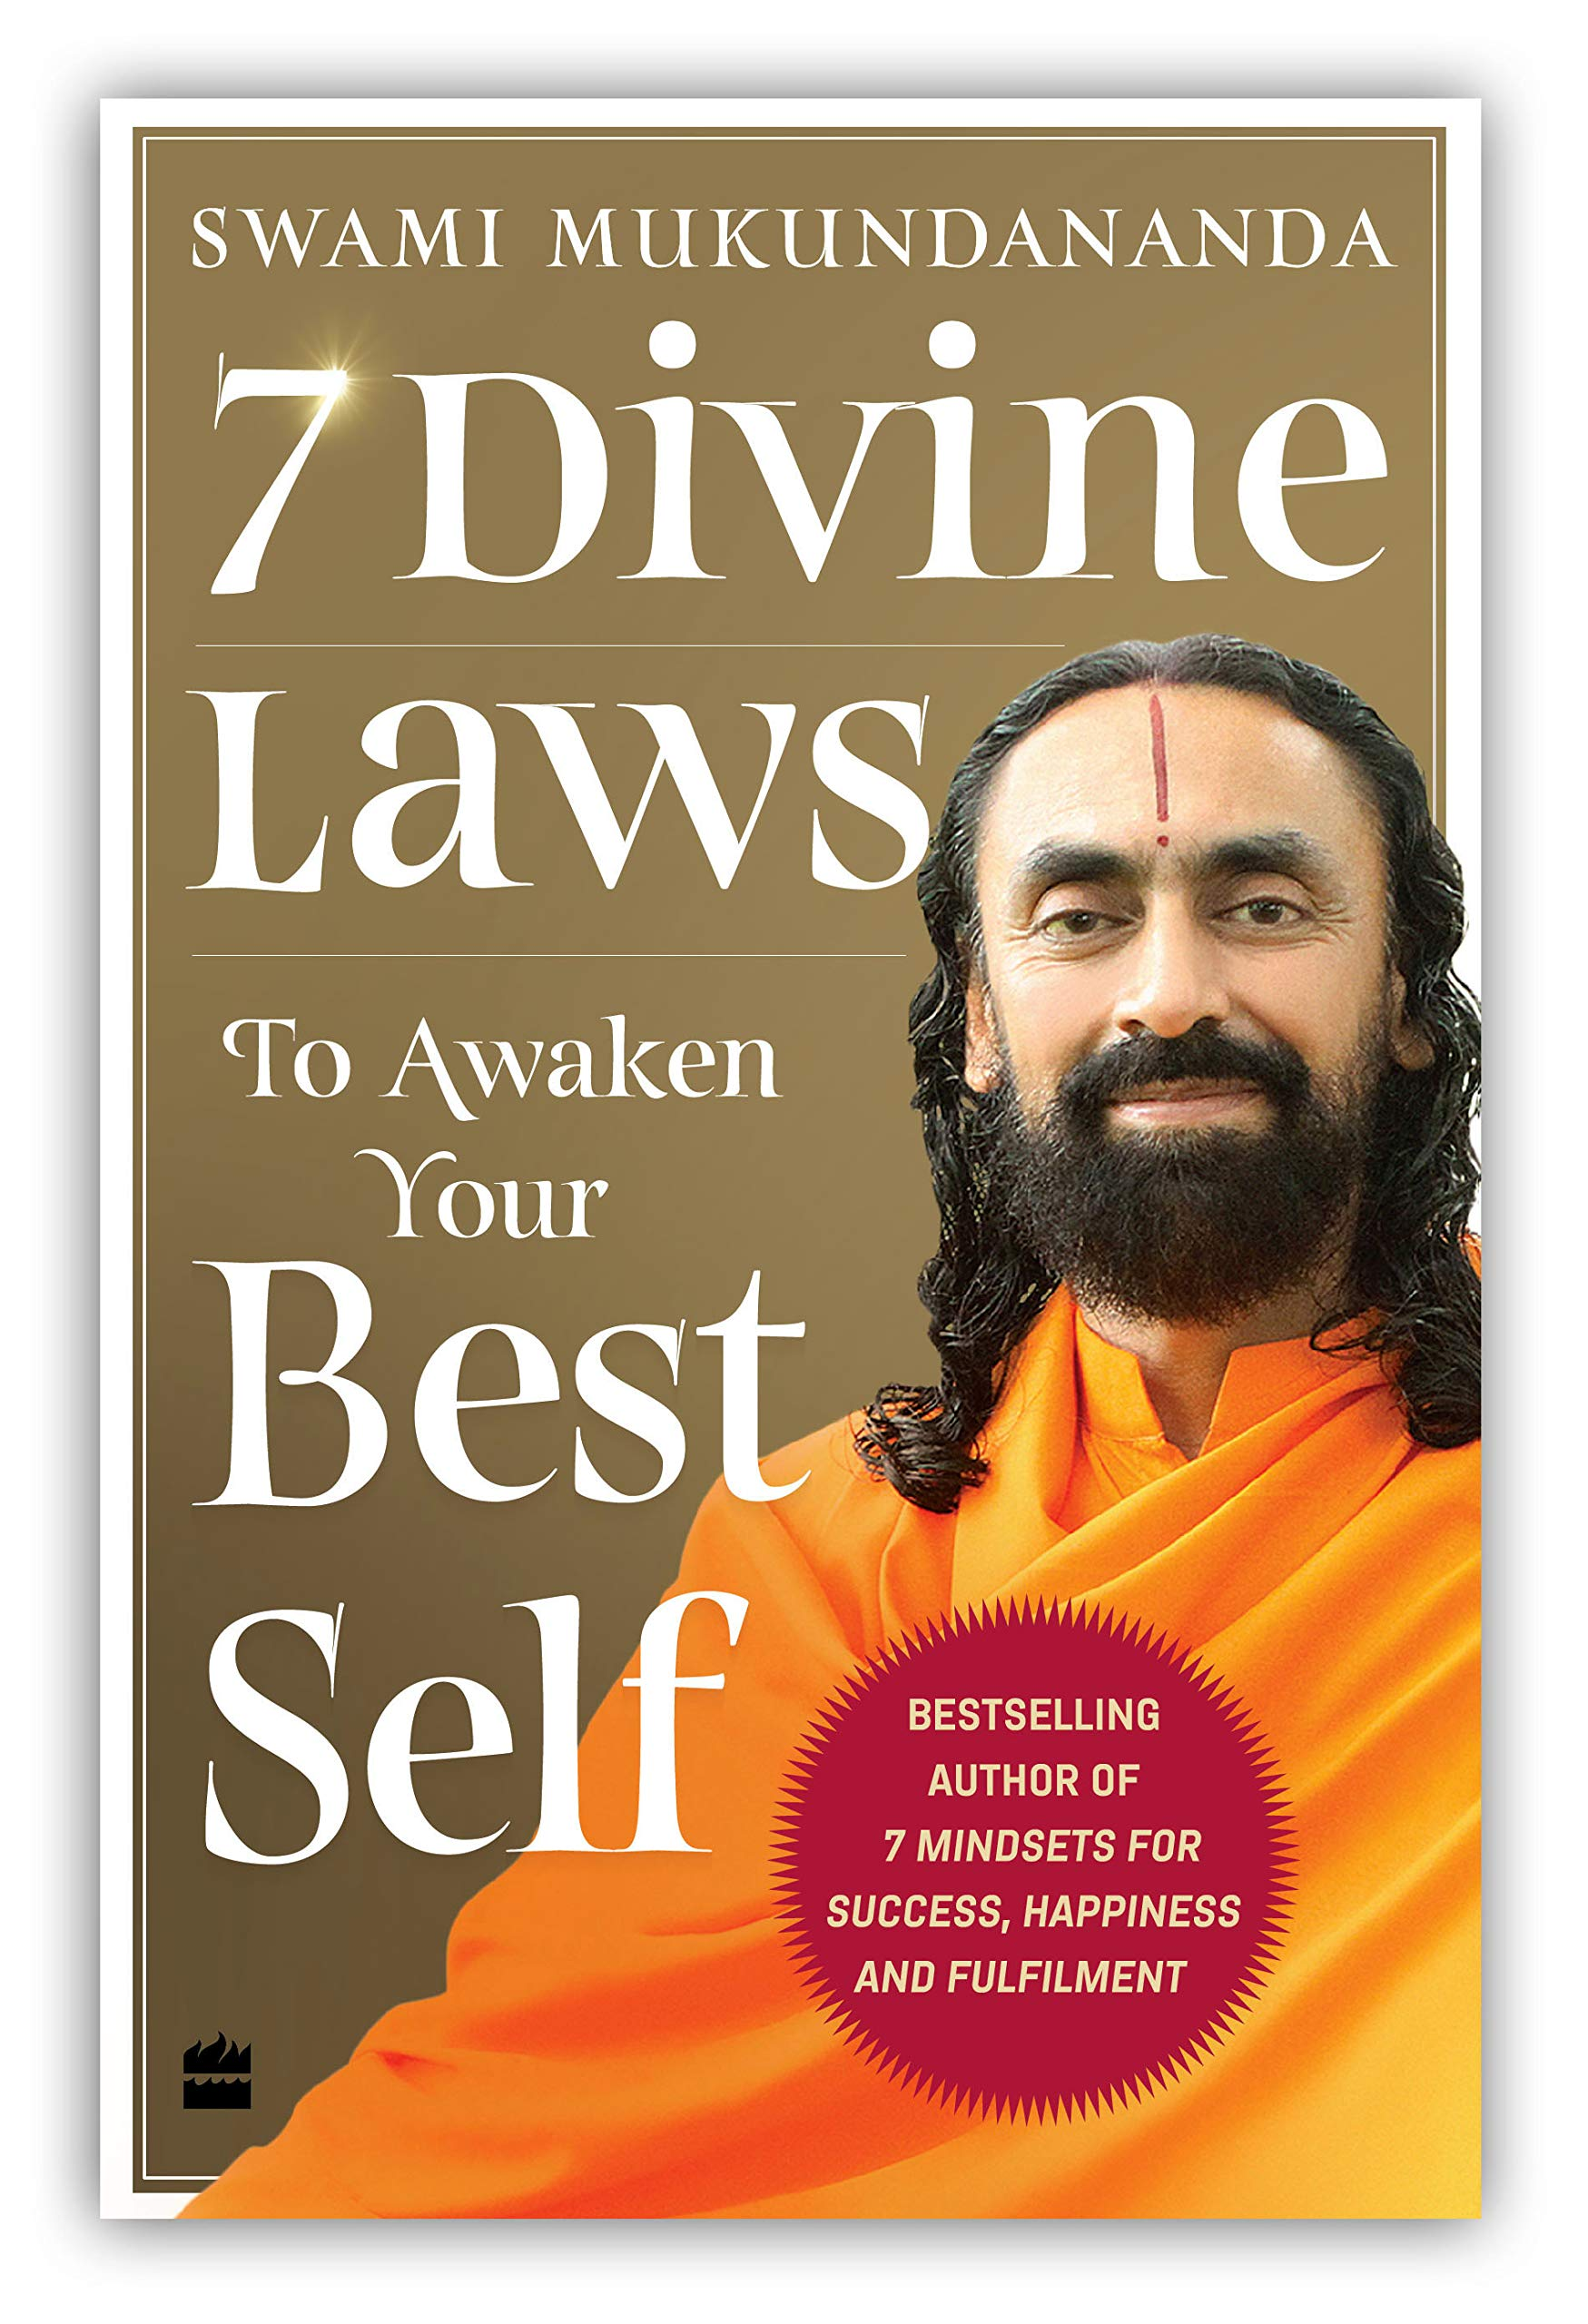 7 Divine Laws To Awaken Your Best Self Amazon In Mukundananda Swami Books